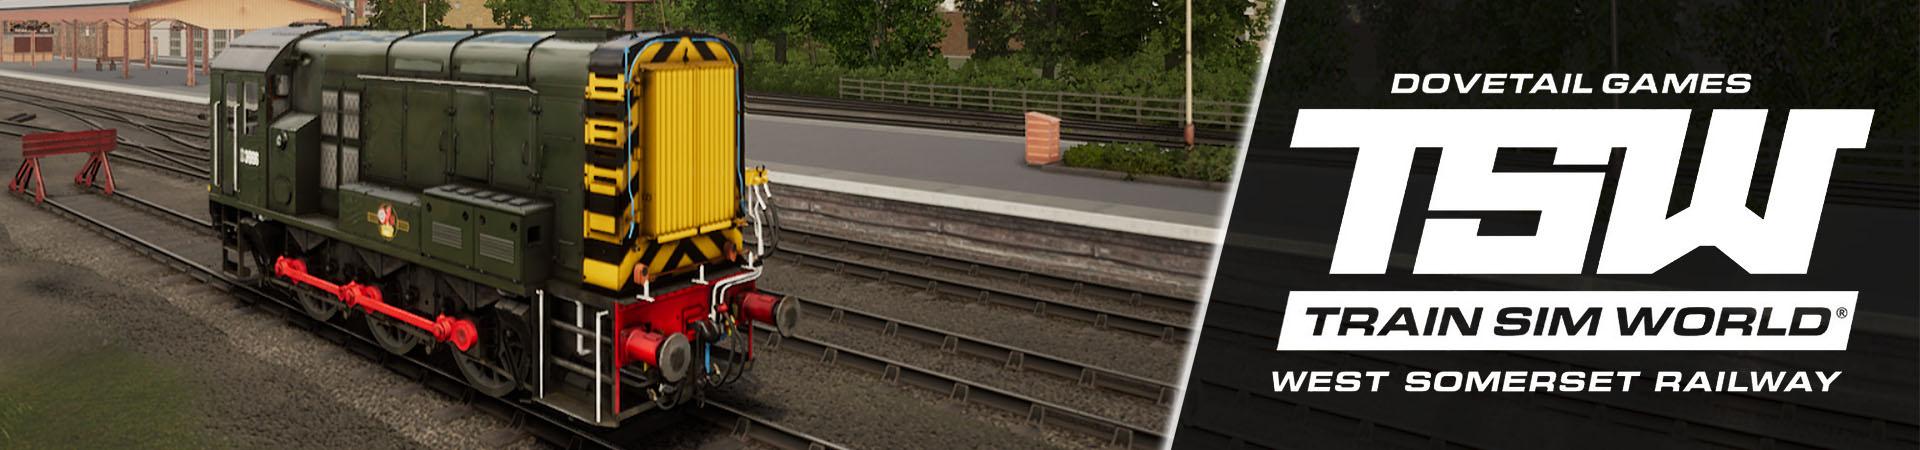 Train Sim World: West Somerset Railway - DLC (PS4) Review | GamePitt -  Dovetail Games